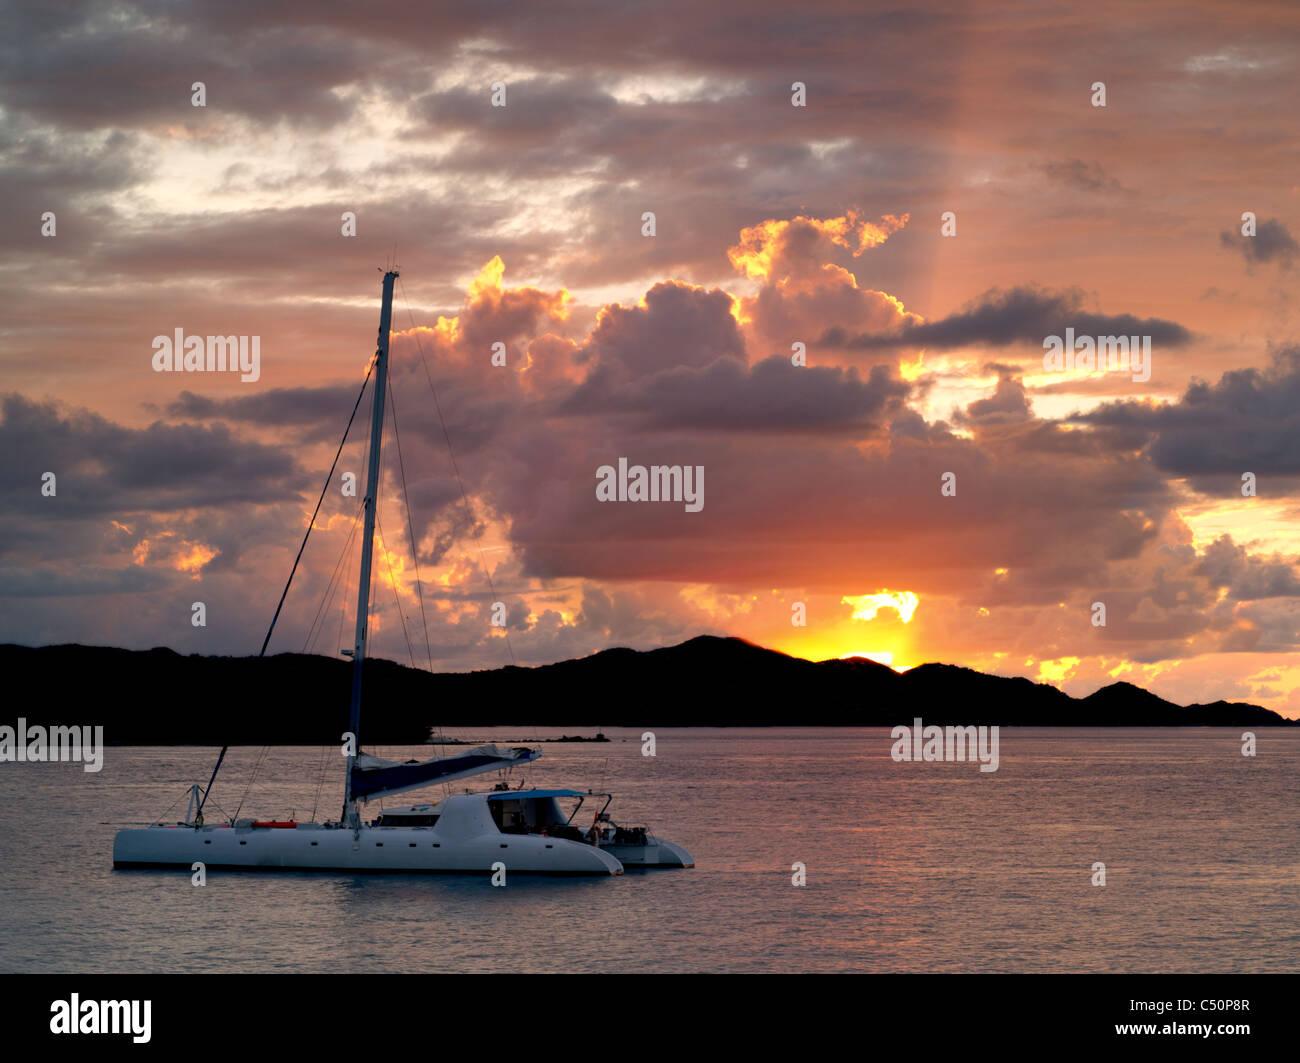 Sailboat off St. John, Virgin Islands and sunset. - Stock Image